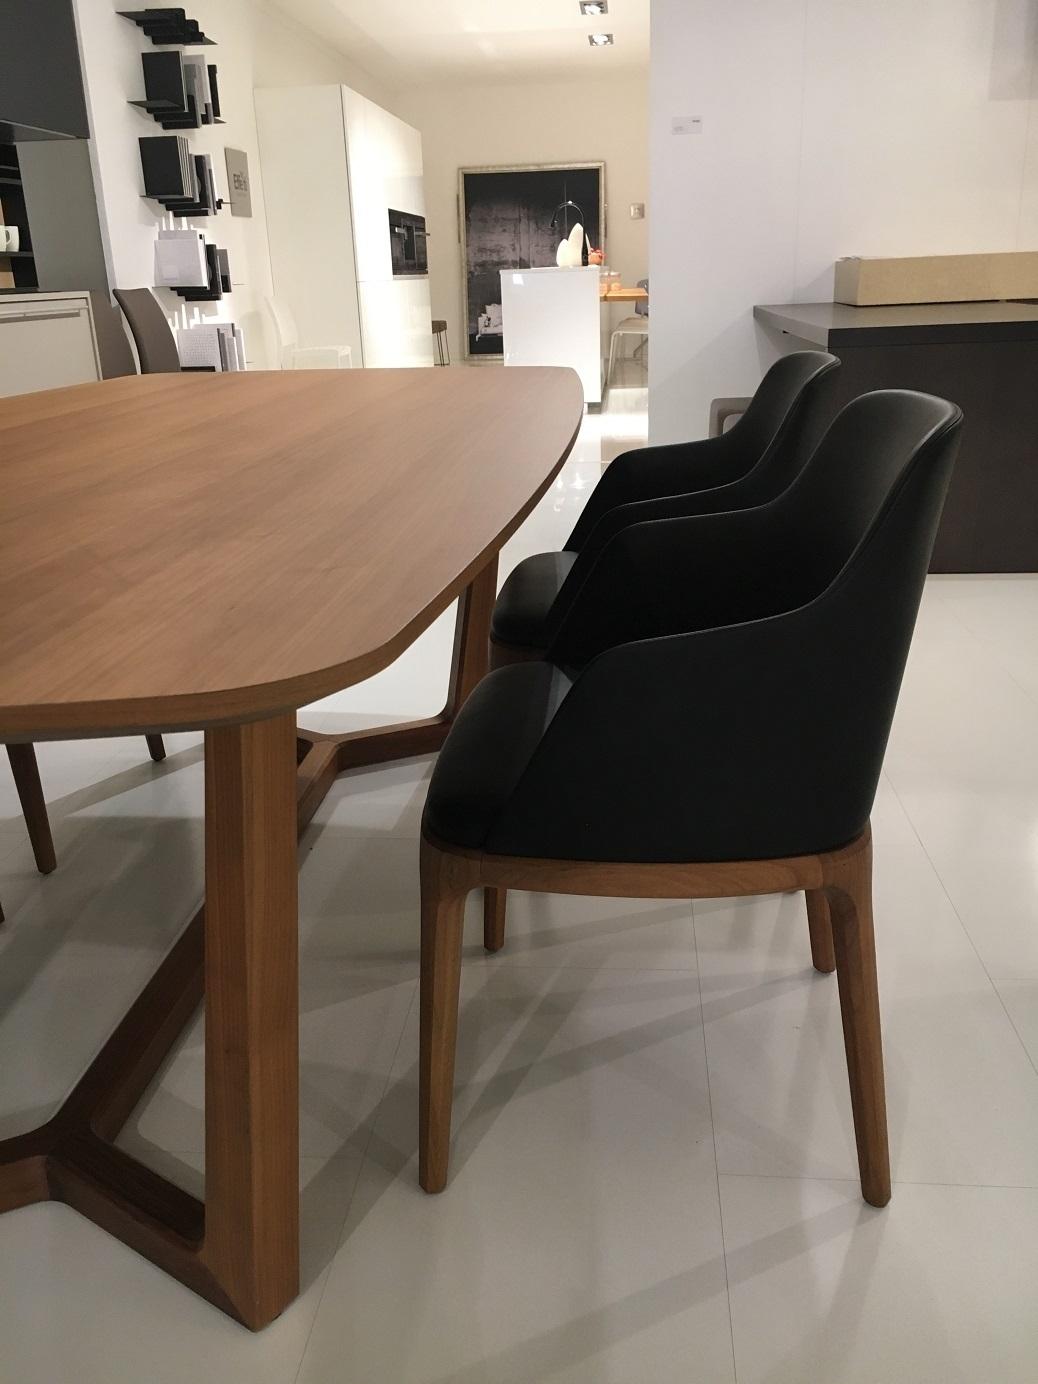 Set di 4 sedie poliform modello grace con braccioli for Poliform sedie